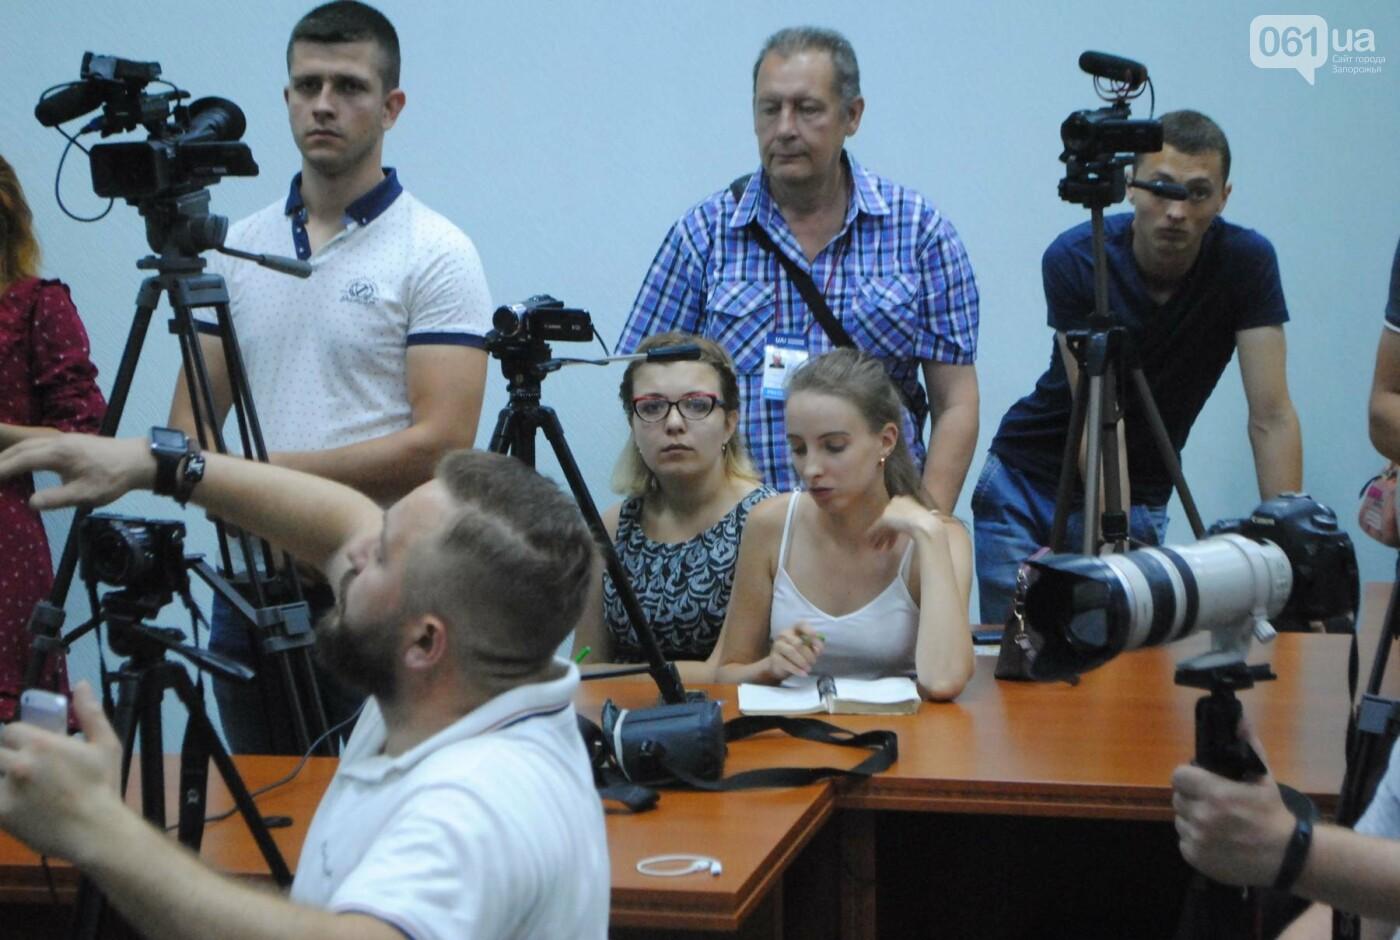 За Олешко следили два дня: в полиции рассказали подробности покушения в Бердянске, - ФОТО, фото-8